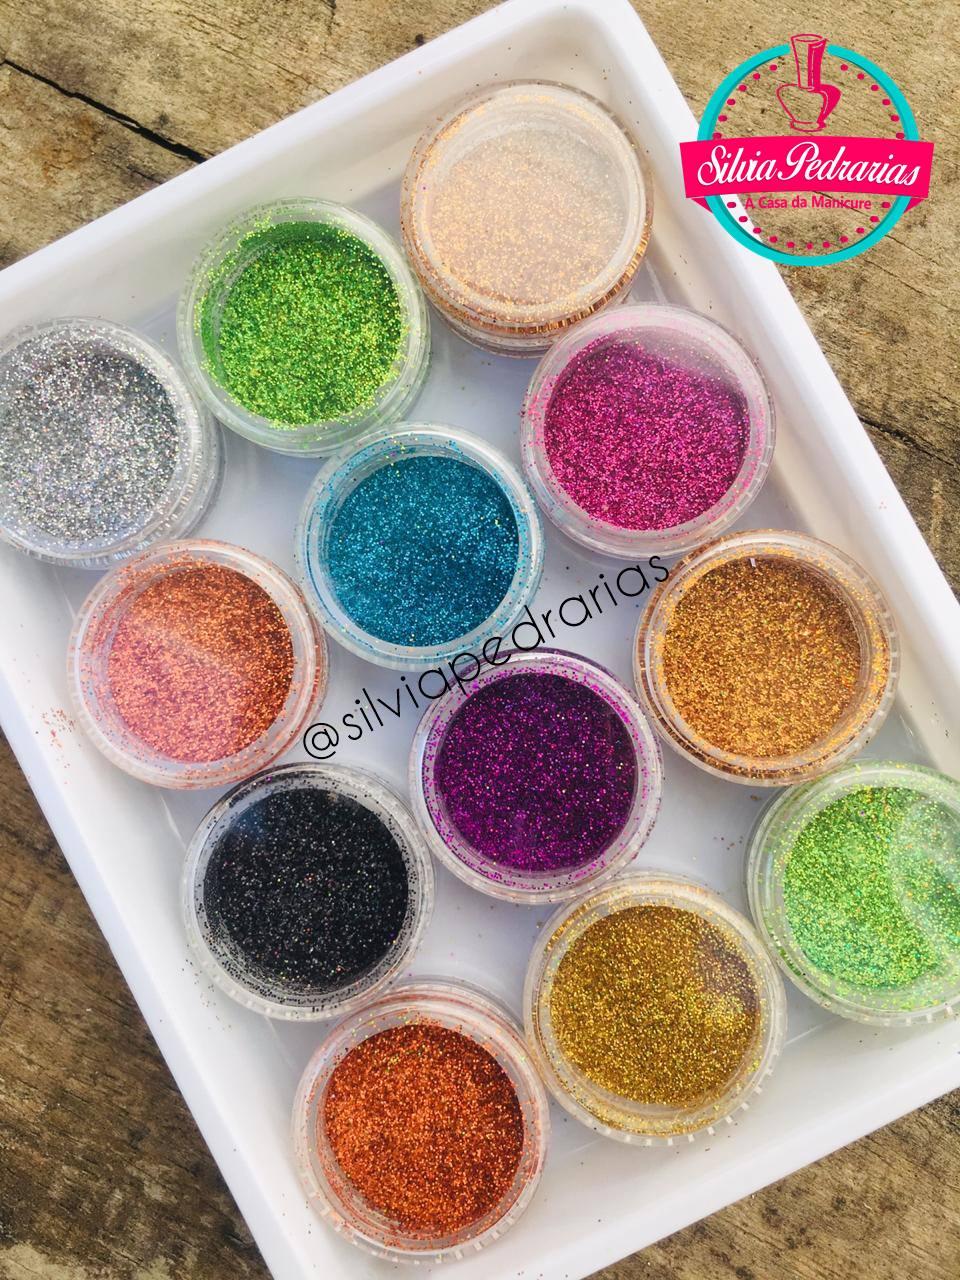 Kit caixinha 12 glitter ultrafino (JeX)  - Sílvia Pedrarias & Cia